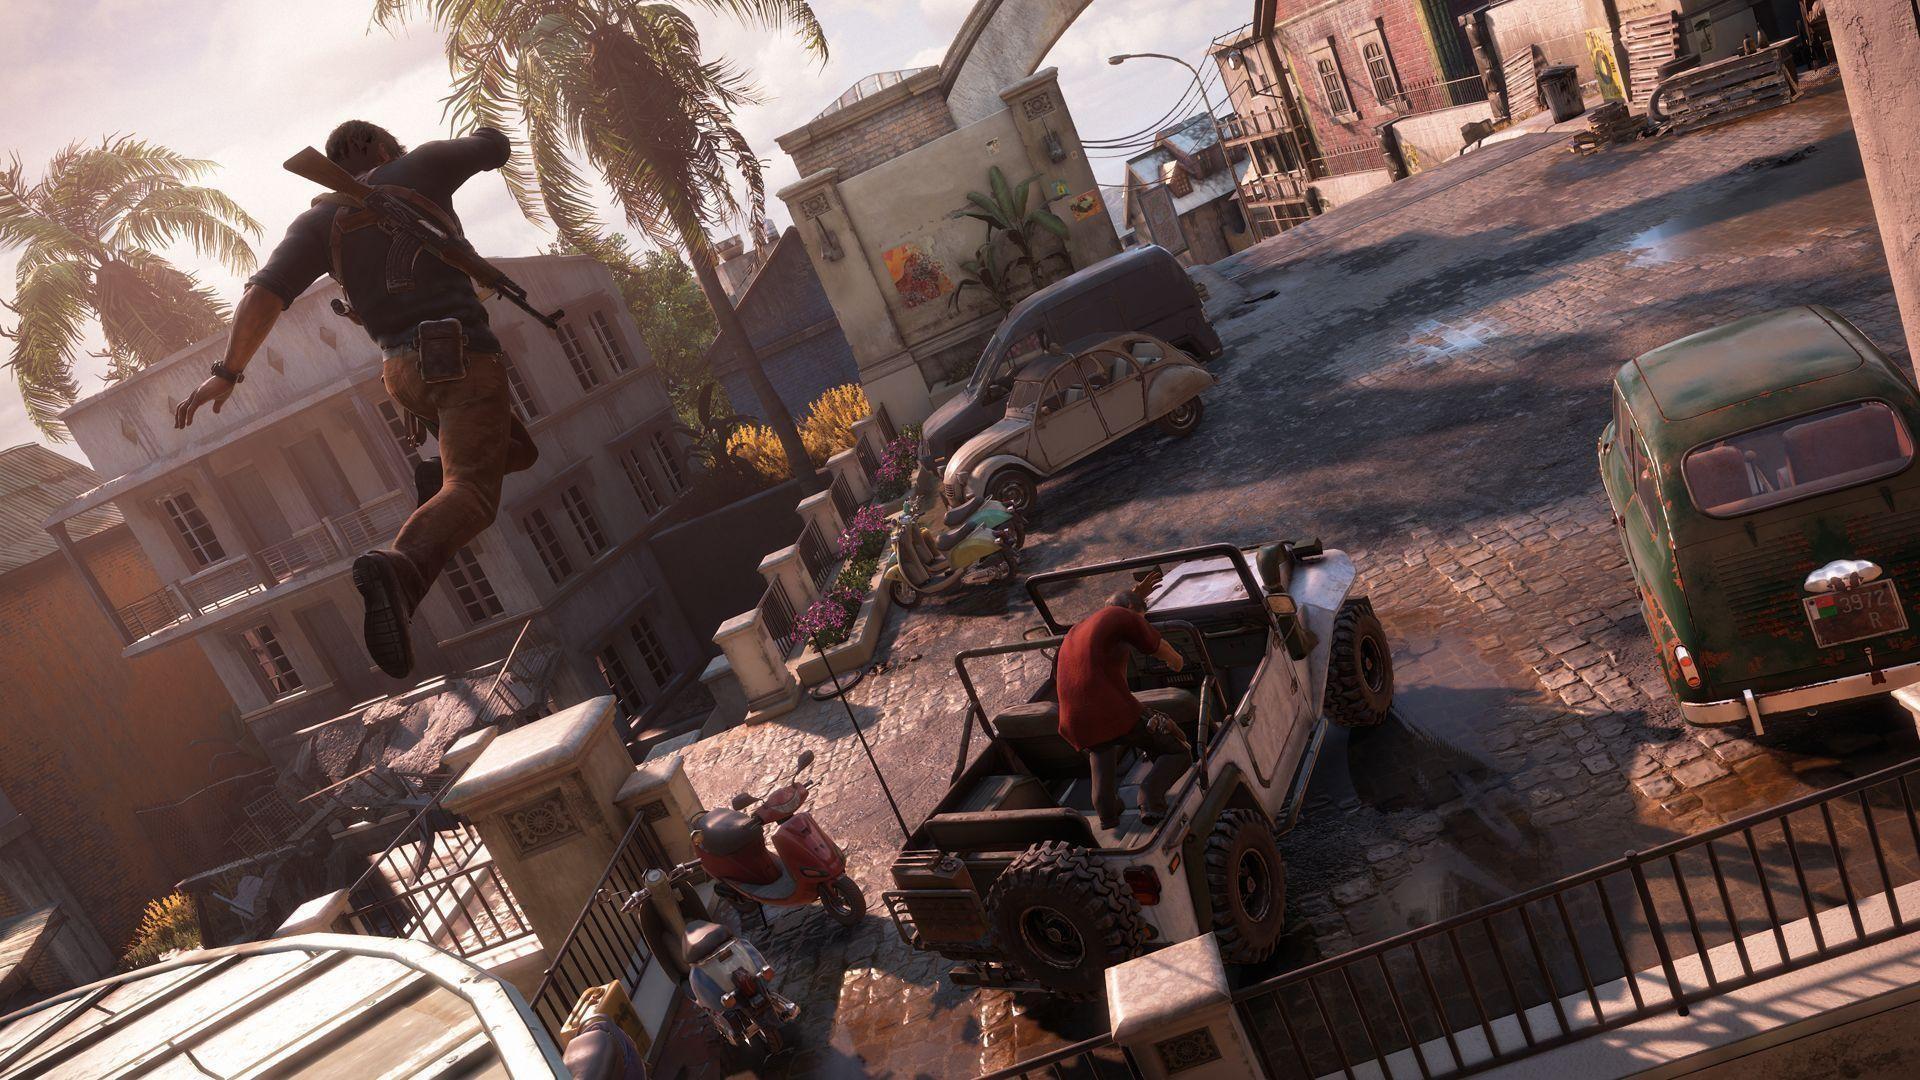 Best Game Uncharted 4 Wallpaper | HD Wallpaper